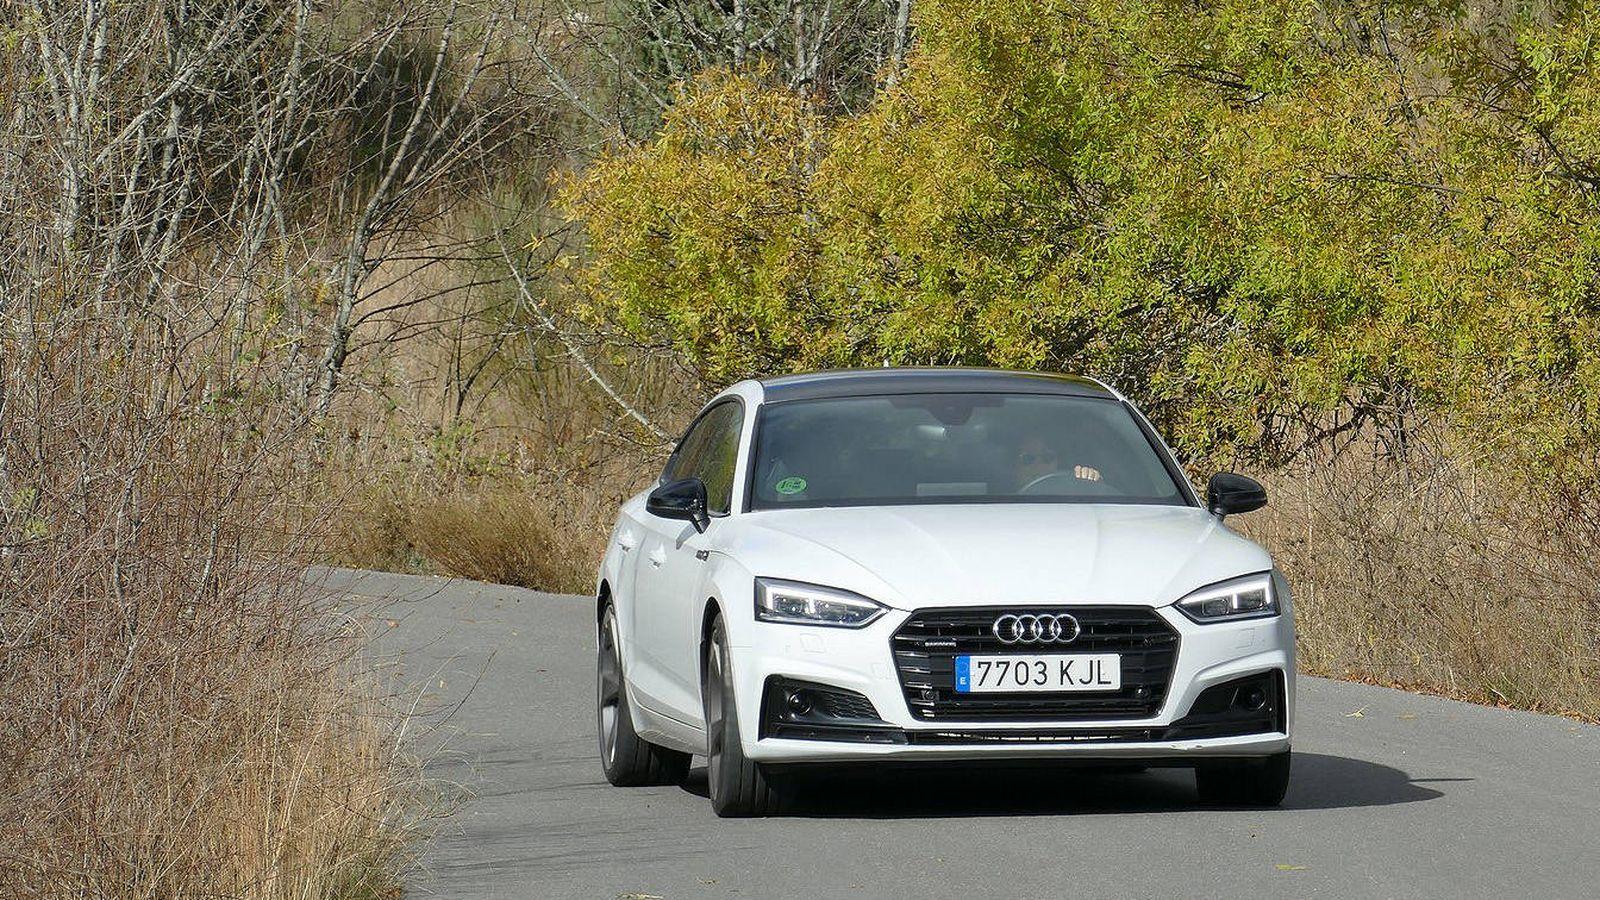 El Novedoso Audi A5 Sportback Una Berlina Espectacular Con Un